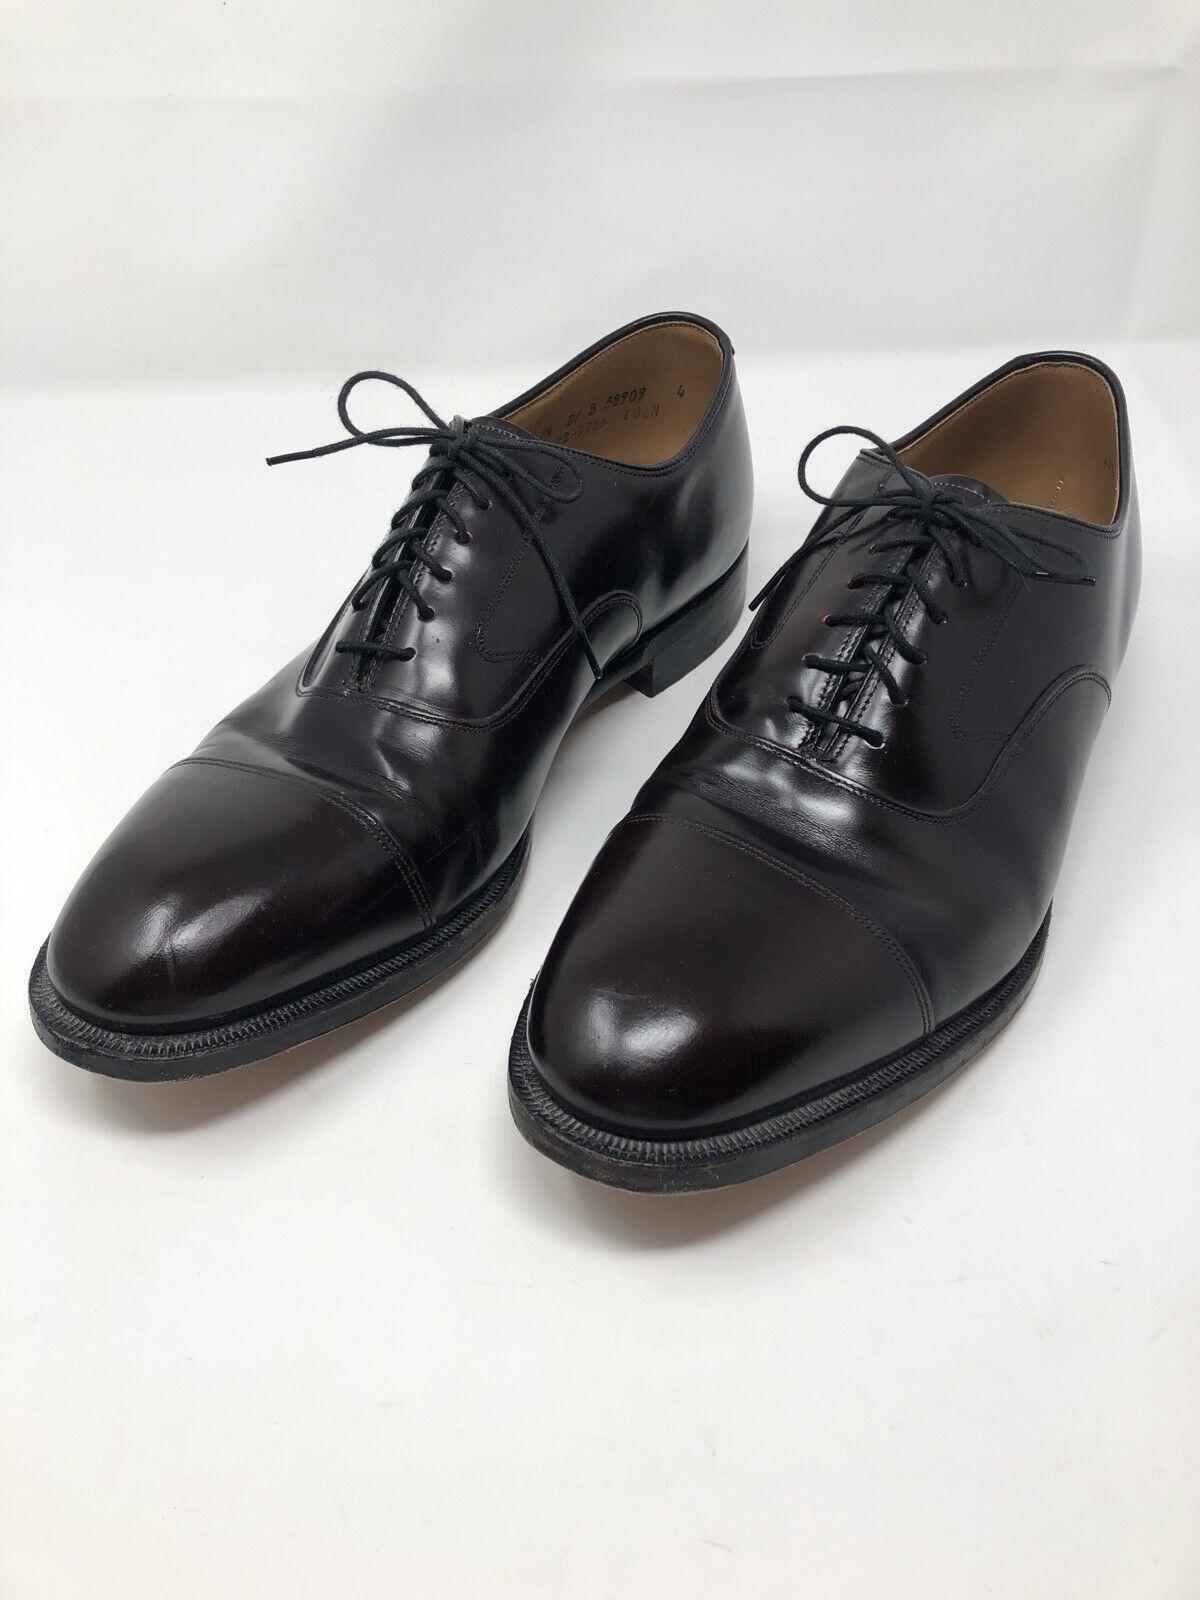 JOHNSTON & MURPHY Optima Melton Mens 11.5 D Oxfords Cap Toe Dress Shoes Burgundy